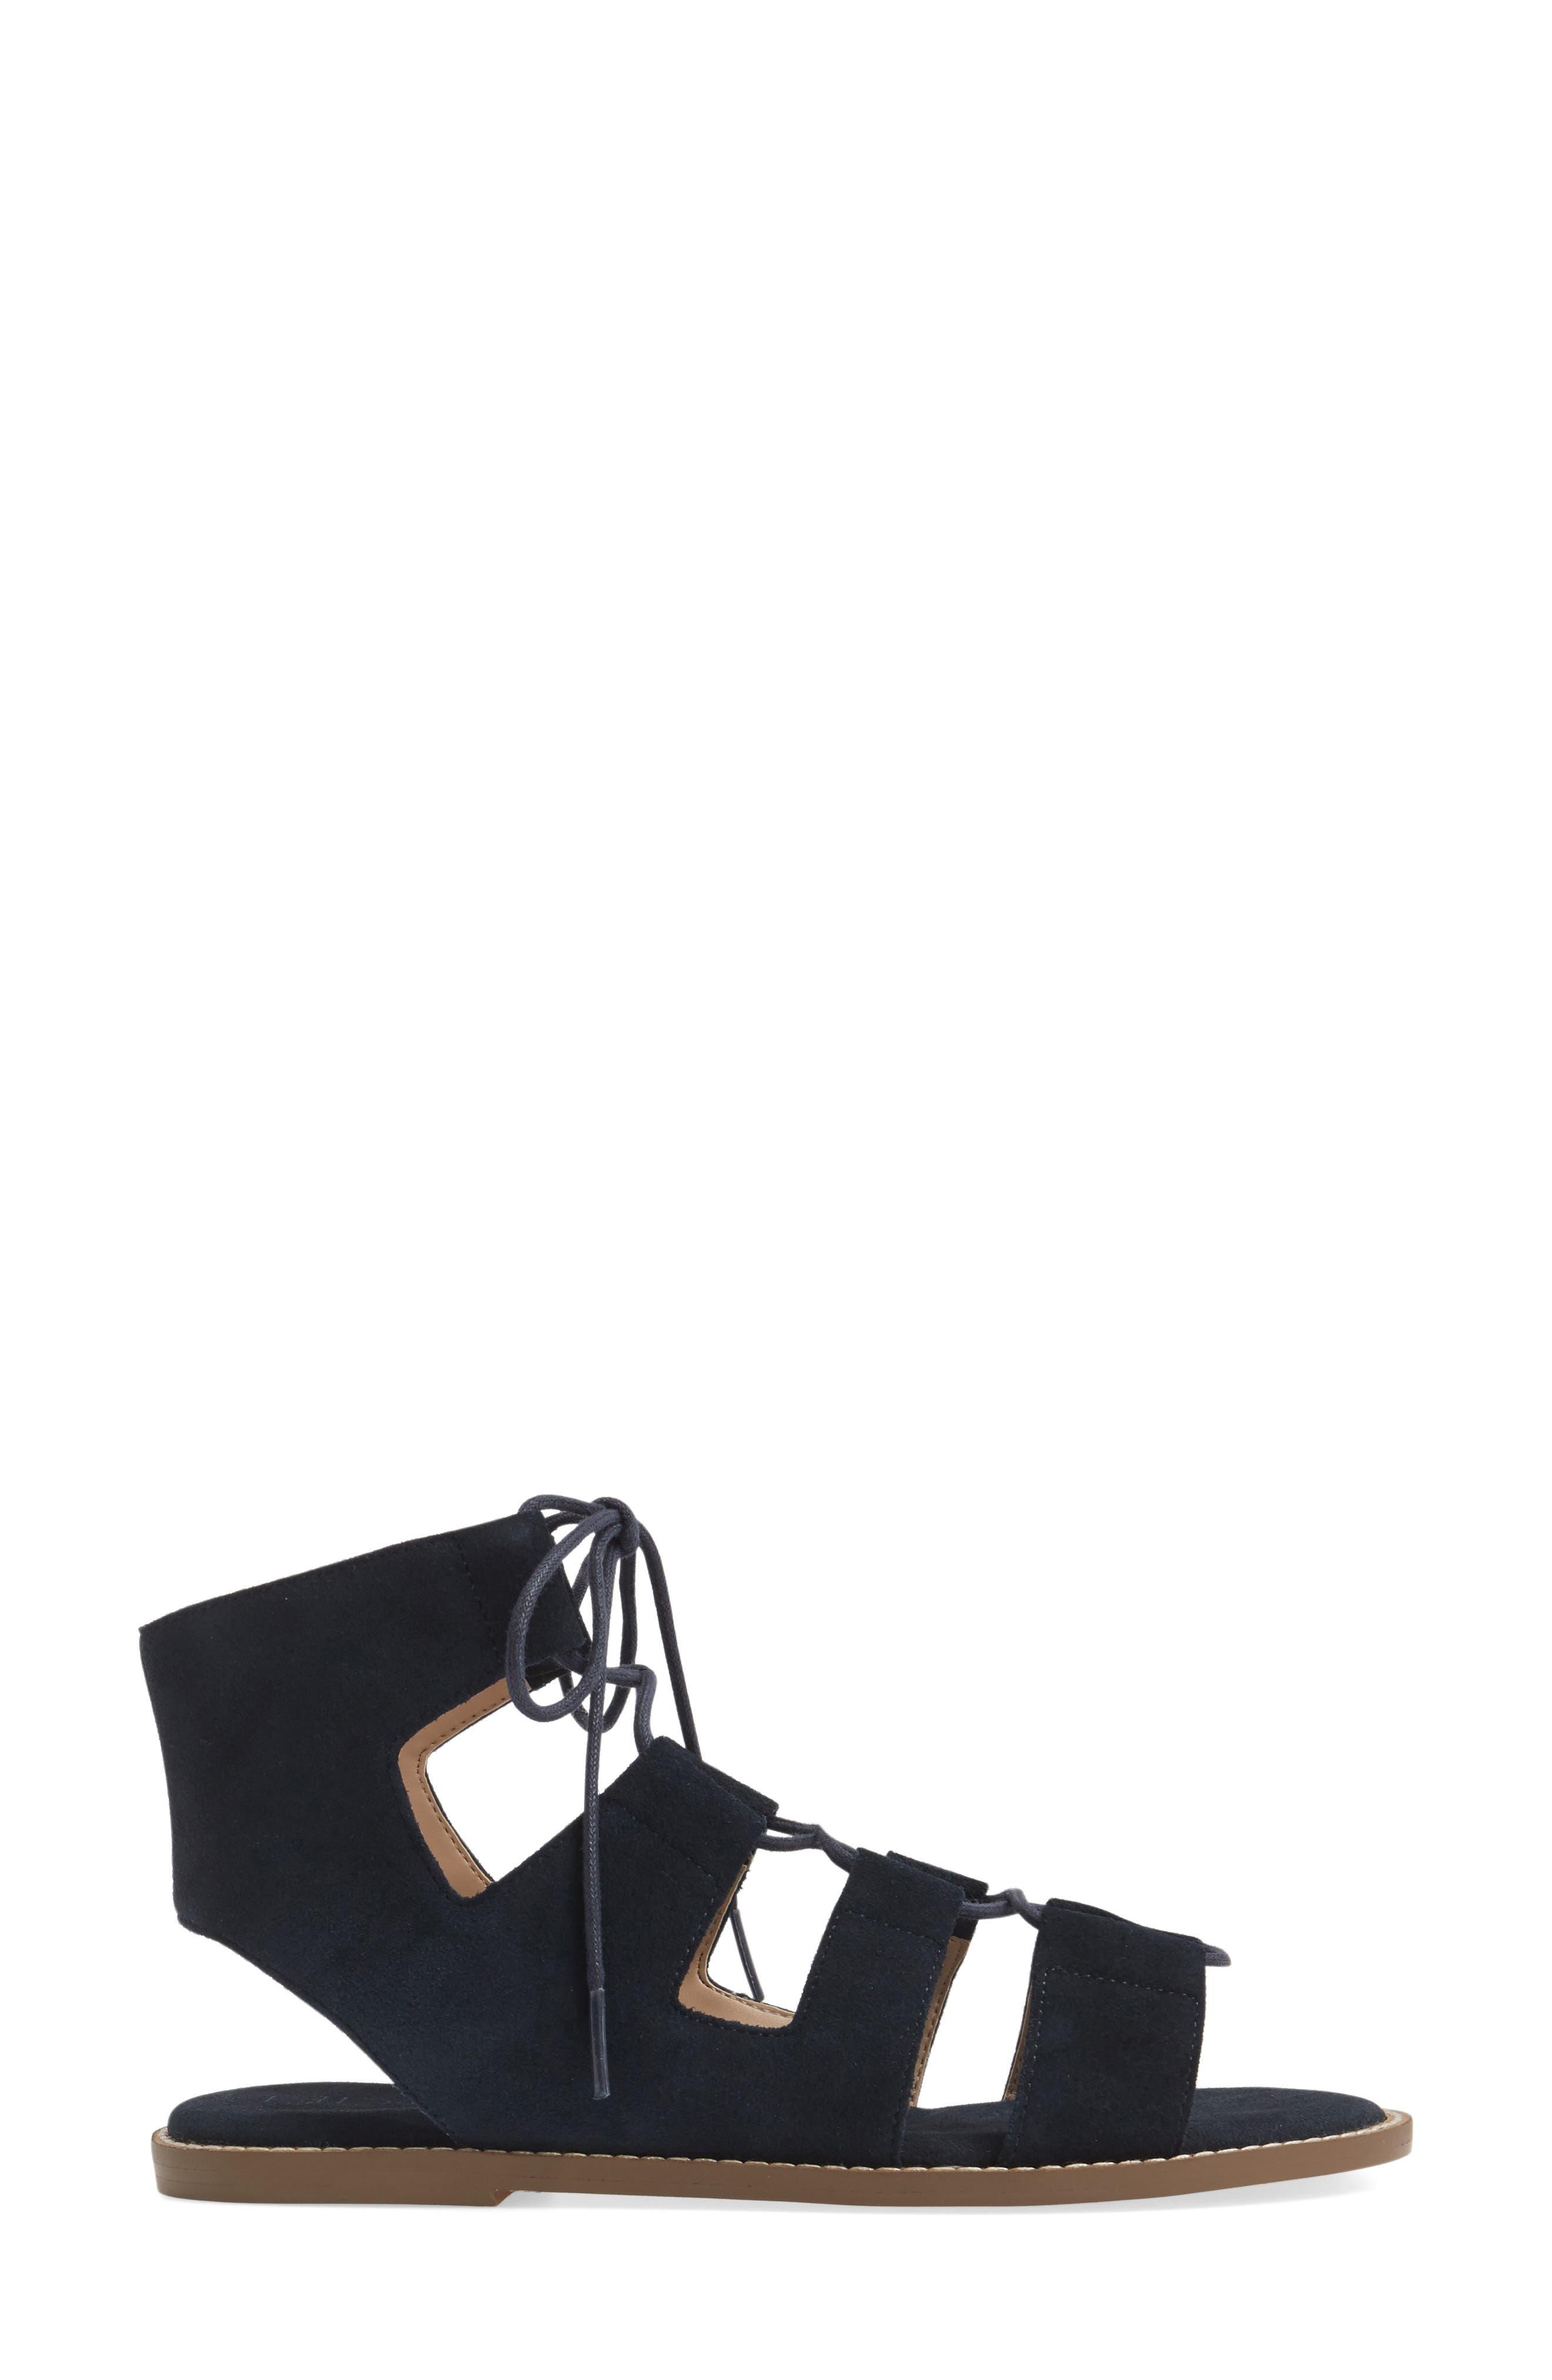 'Cady' Lace-Up Flat Sandal,                             Alternate thumbnail 12, color,